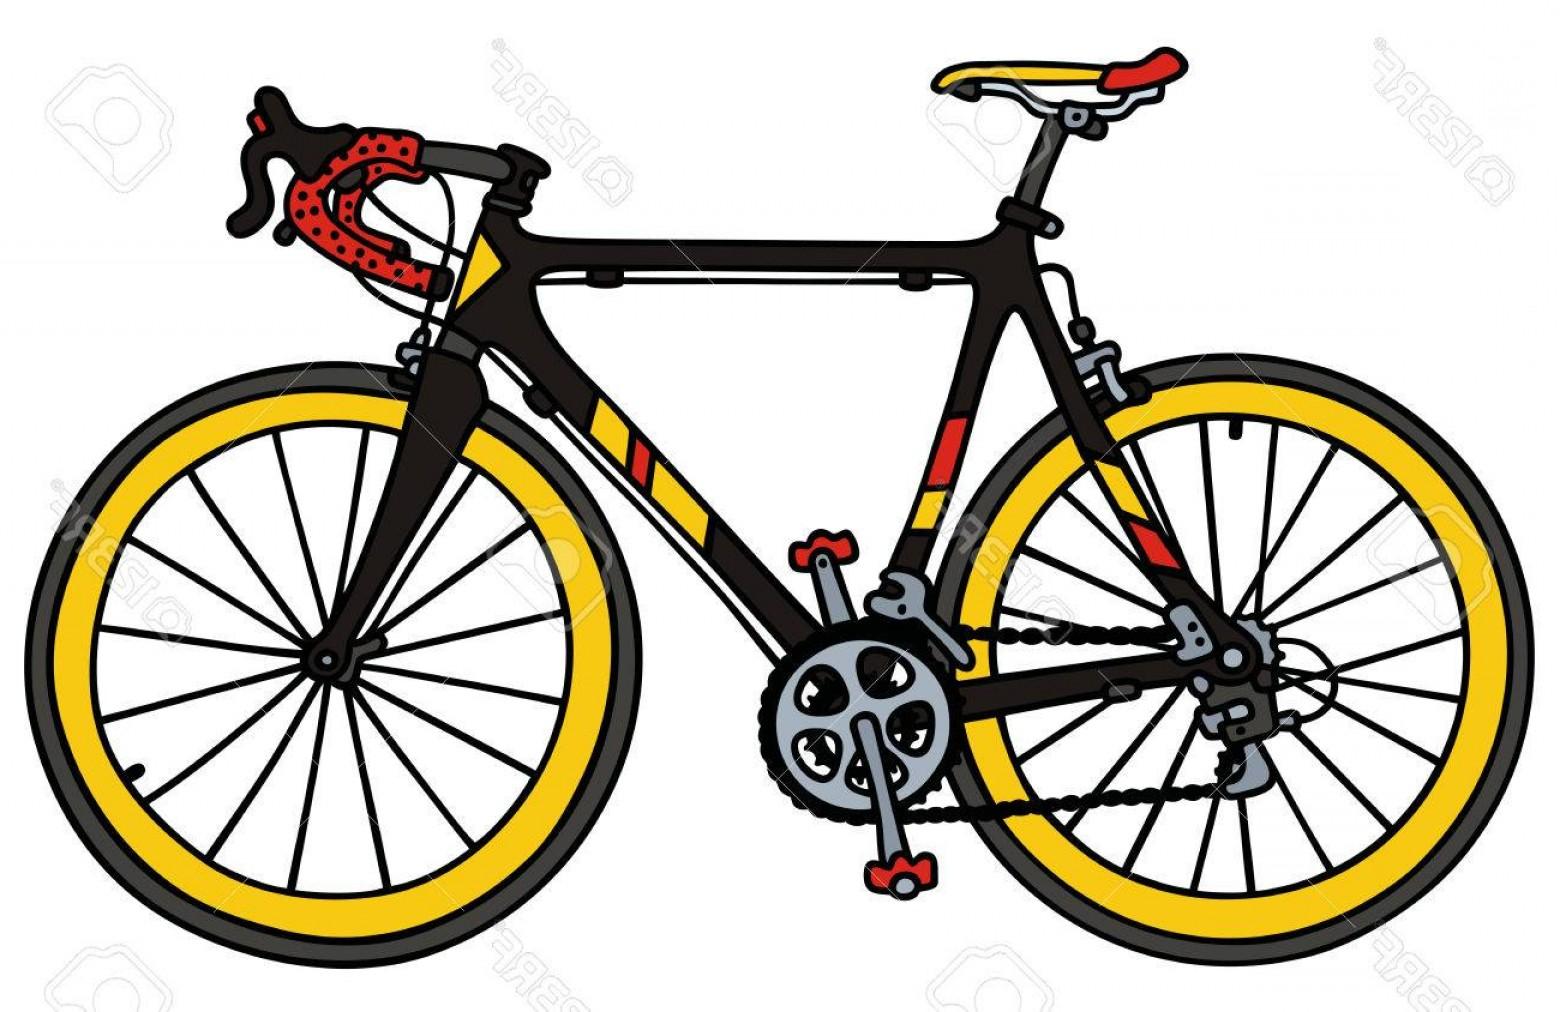 1560x1012 Photostock Vector Hand Drawing Of A Black Road Racing Bike